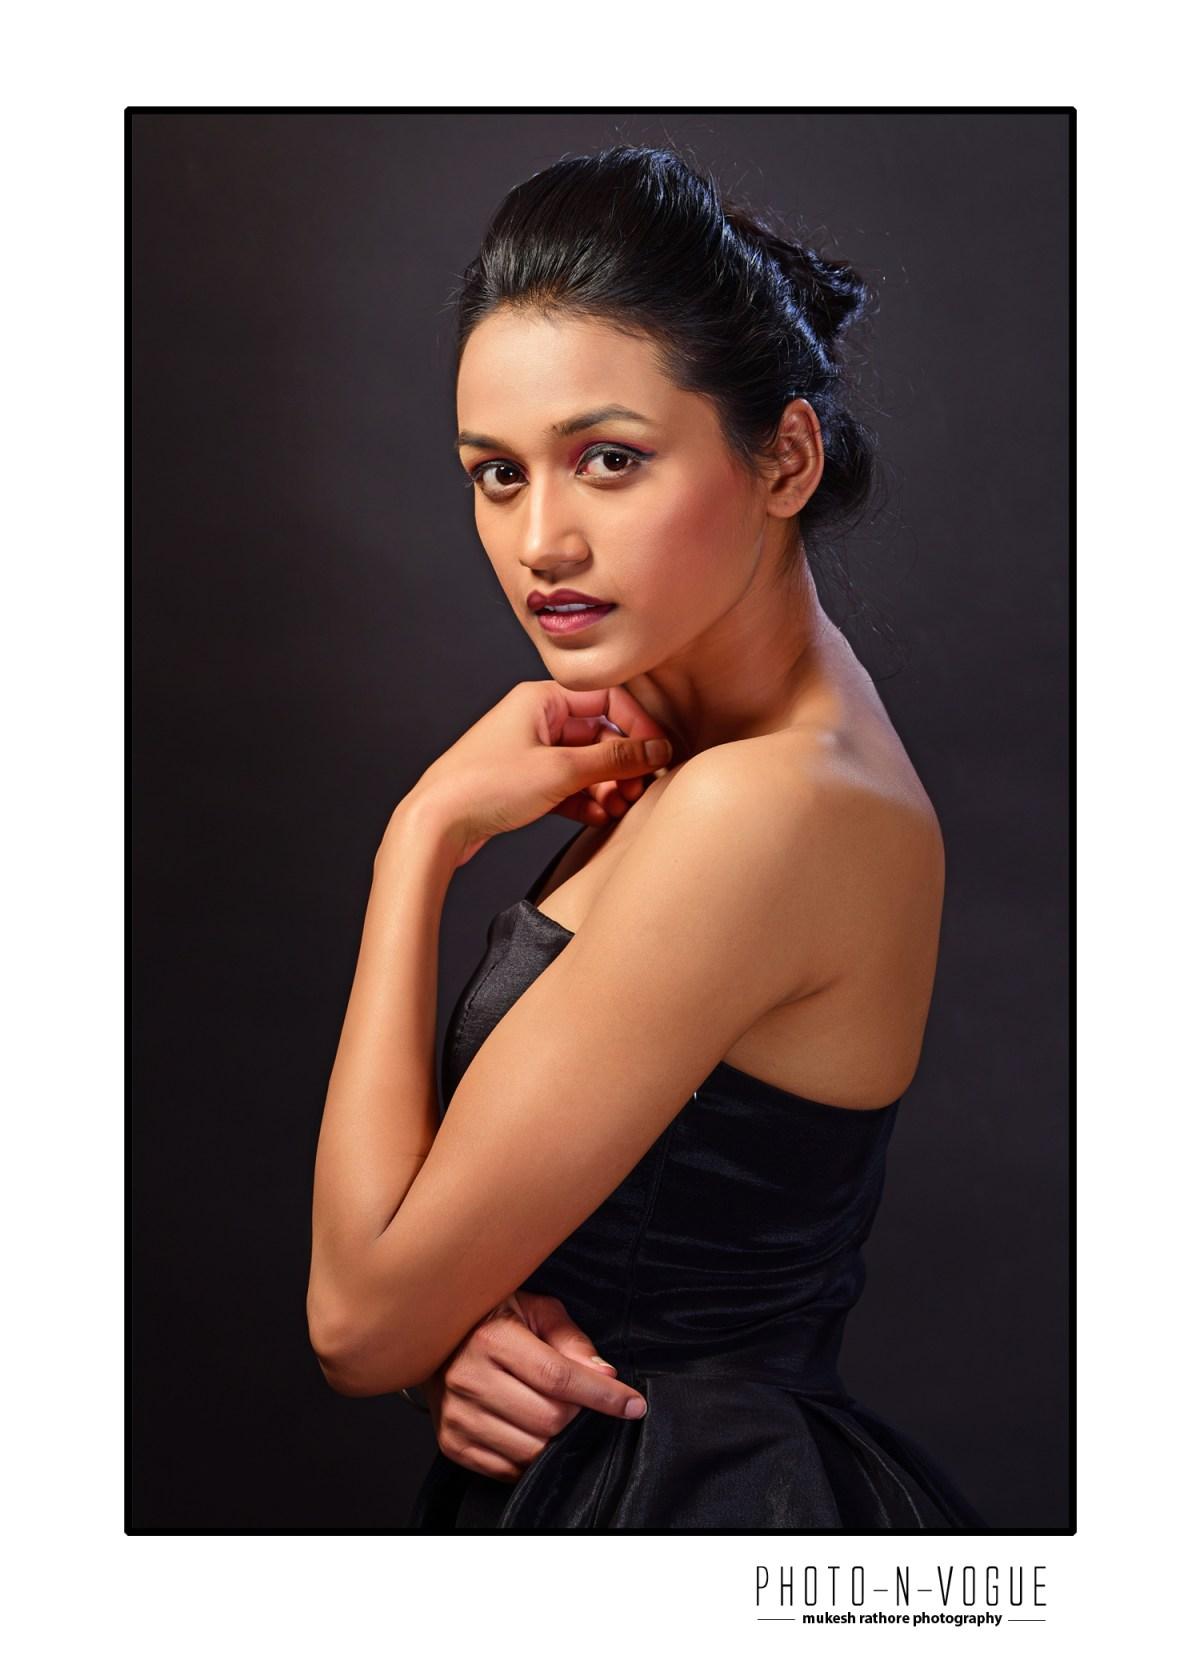 In Lens by Photo N Vogue: Priyanka Kumari, Miss TGPC Supermodel 2016